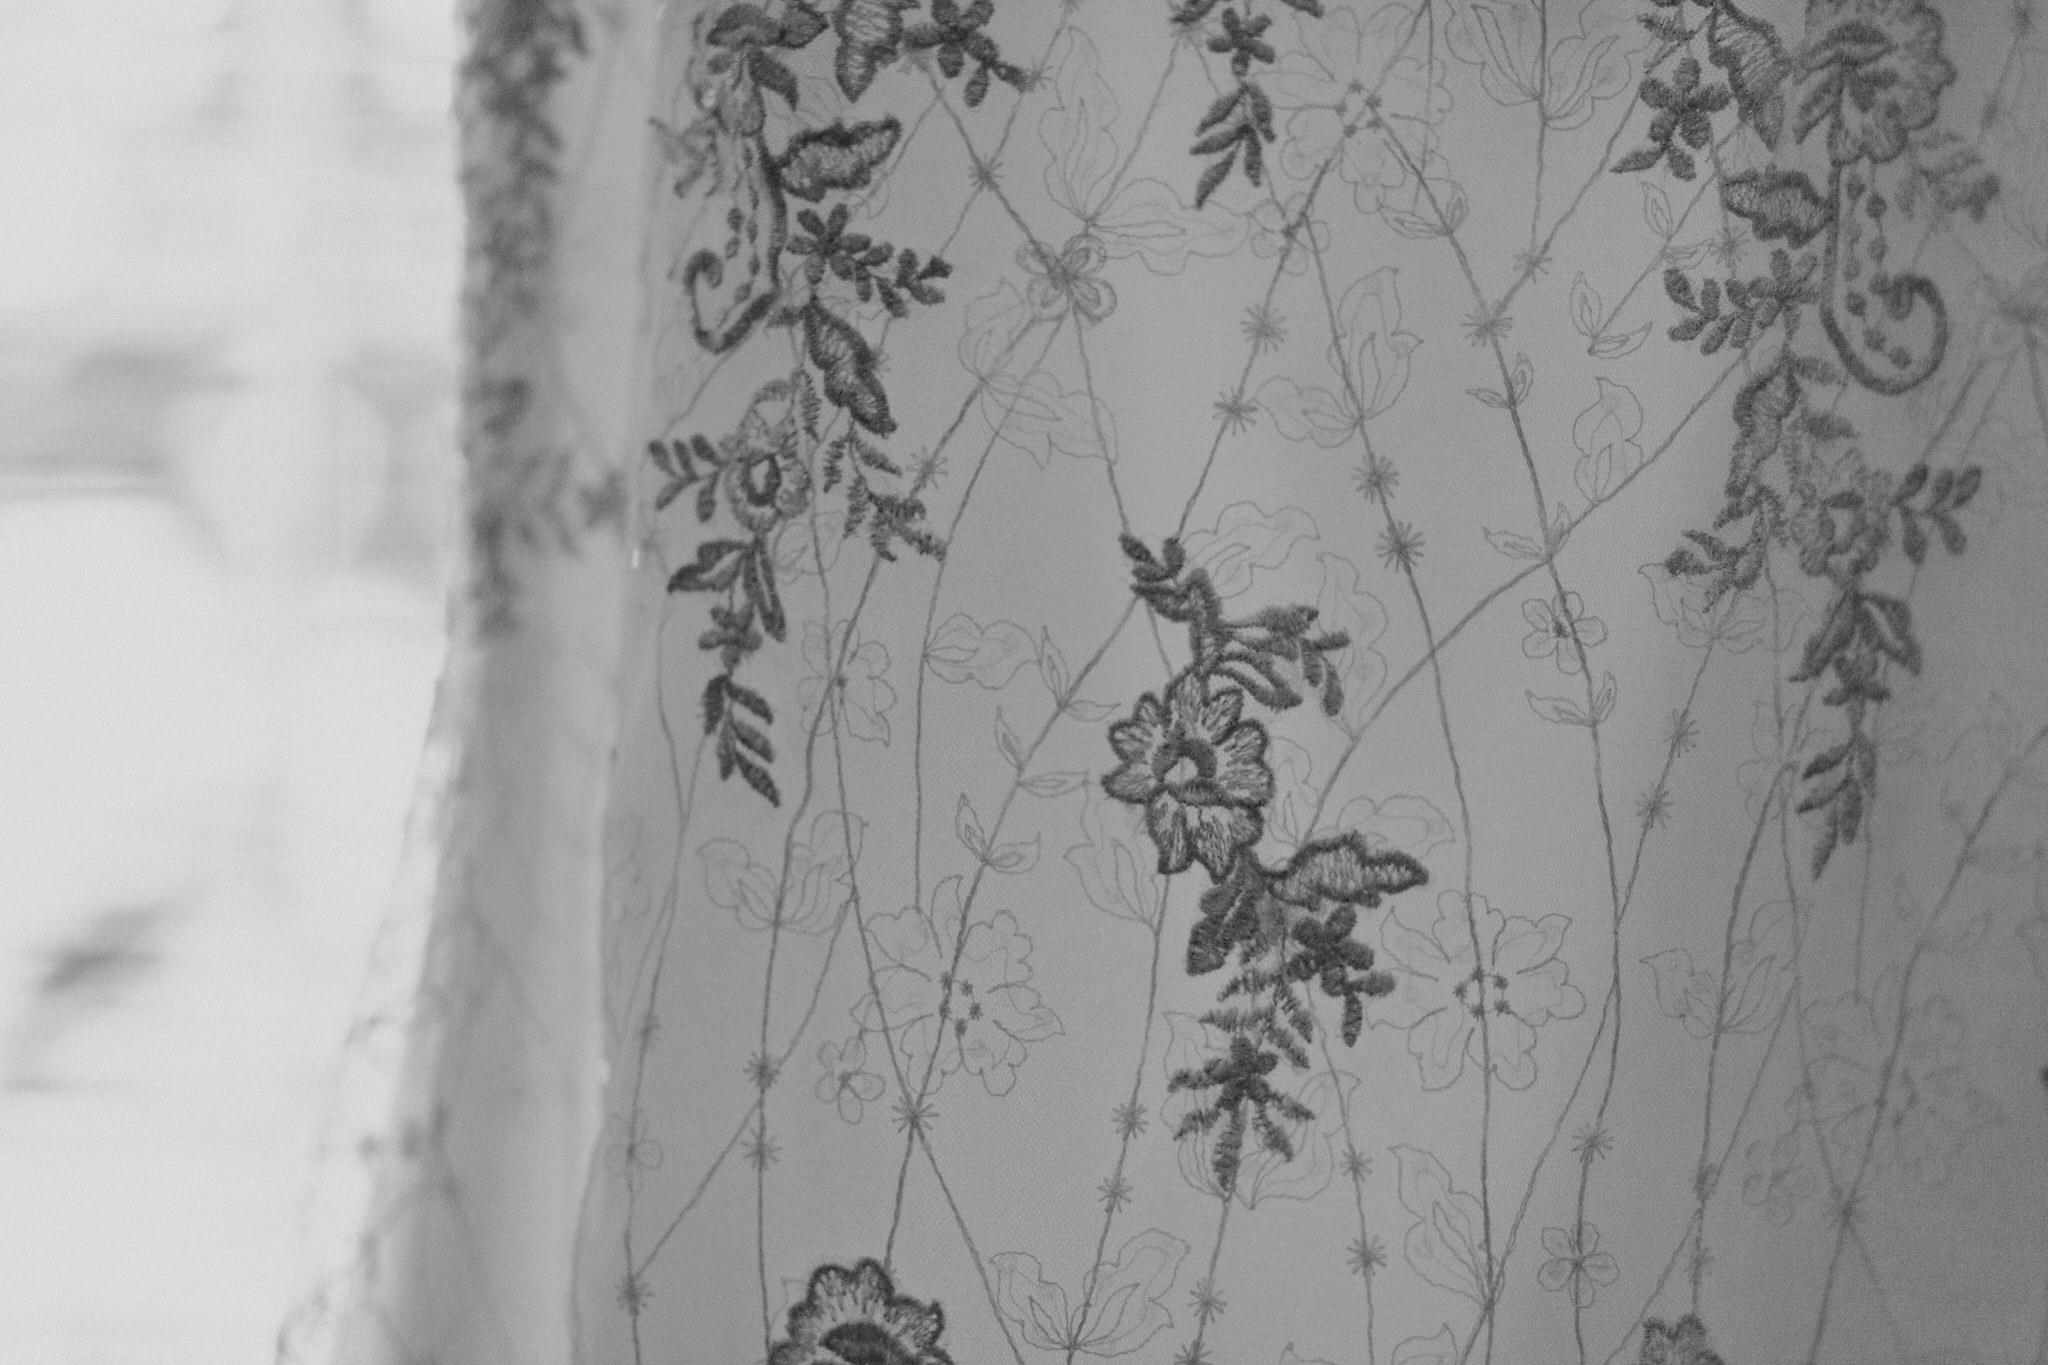 Whitby Wedding Photographer Carol Poitras - Dress details